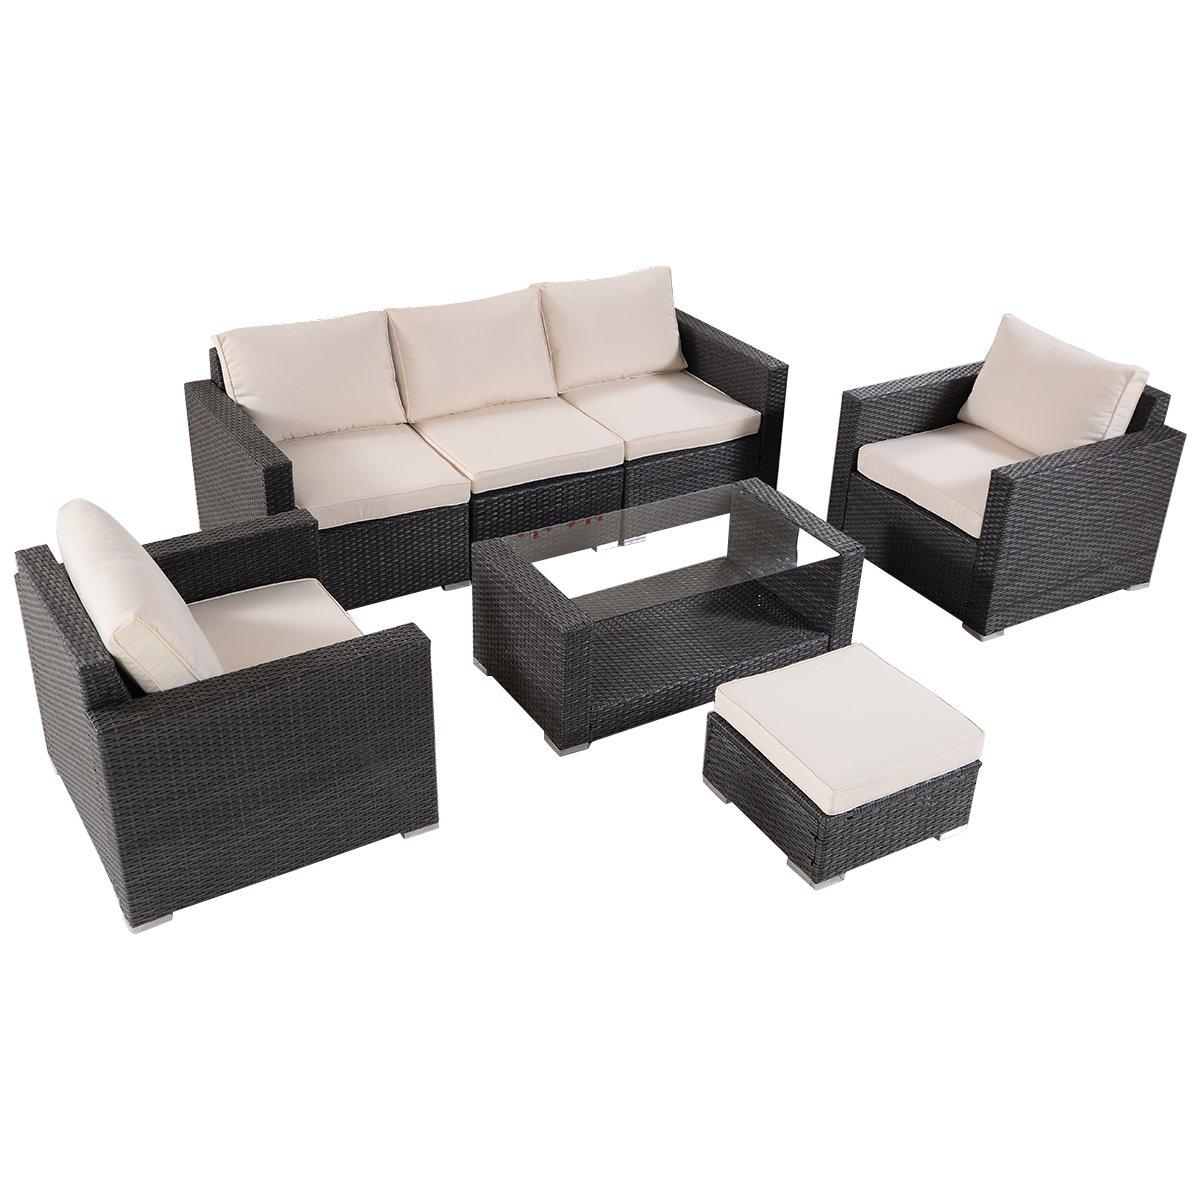 Tangkula 7 PCS Outdoor Patio Rattan Wicker Furniture Set Sectional Sofa Table Cushioned